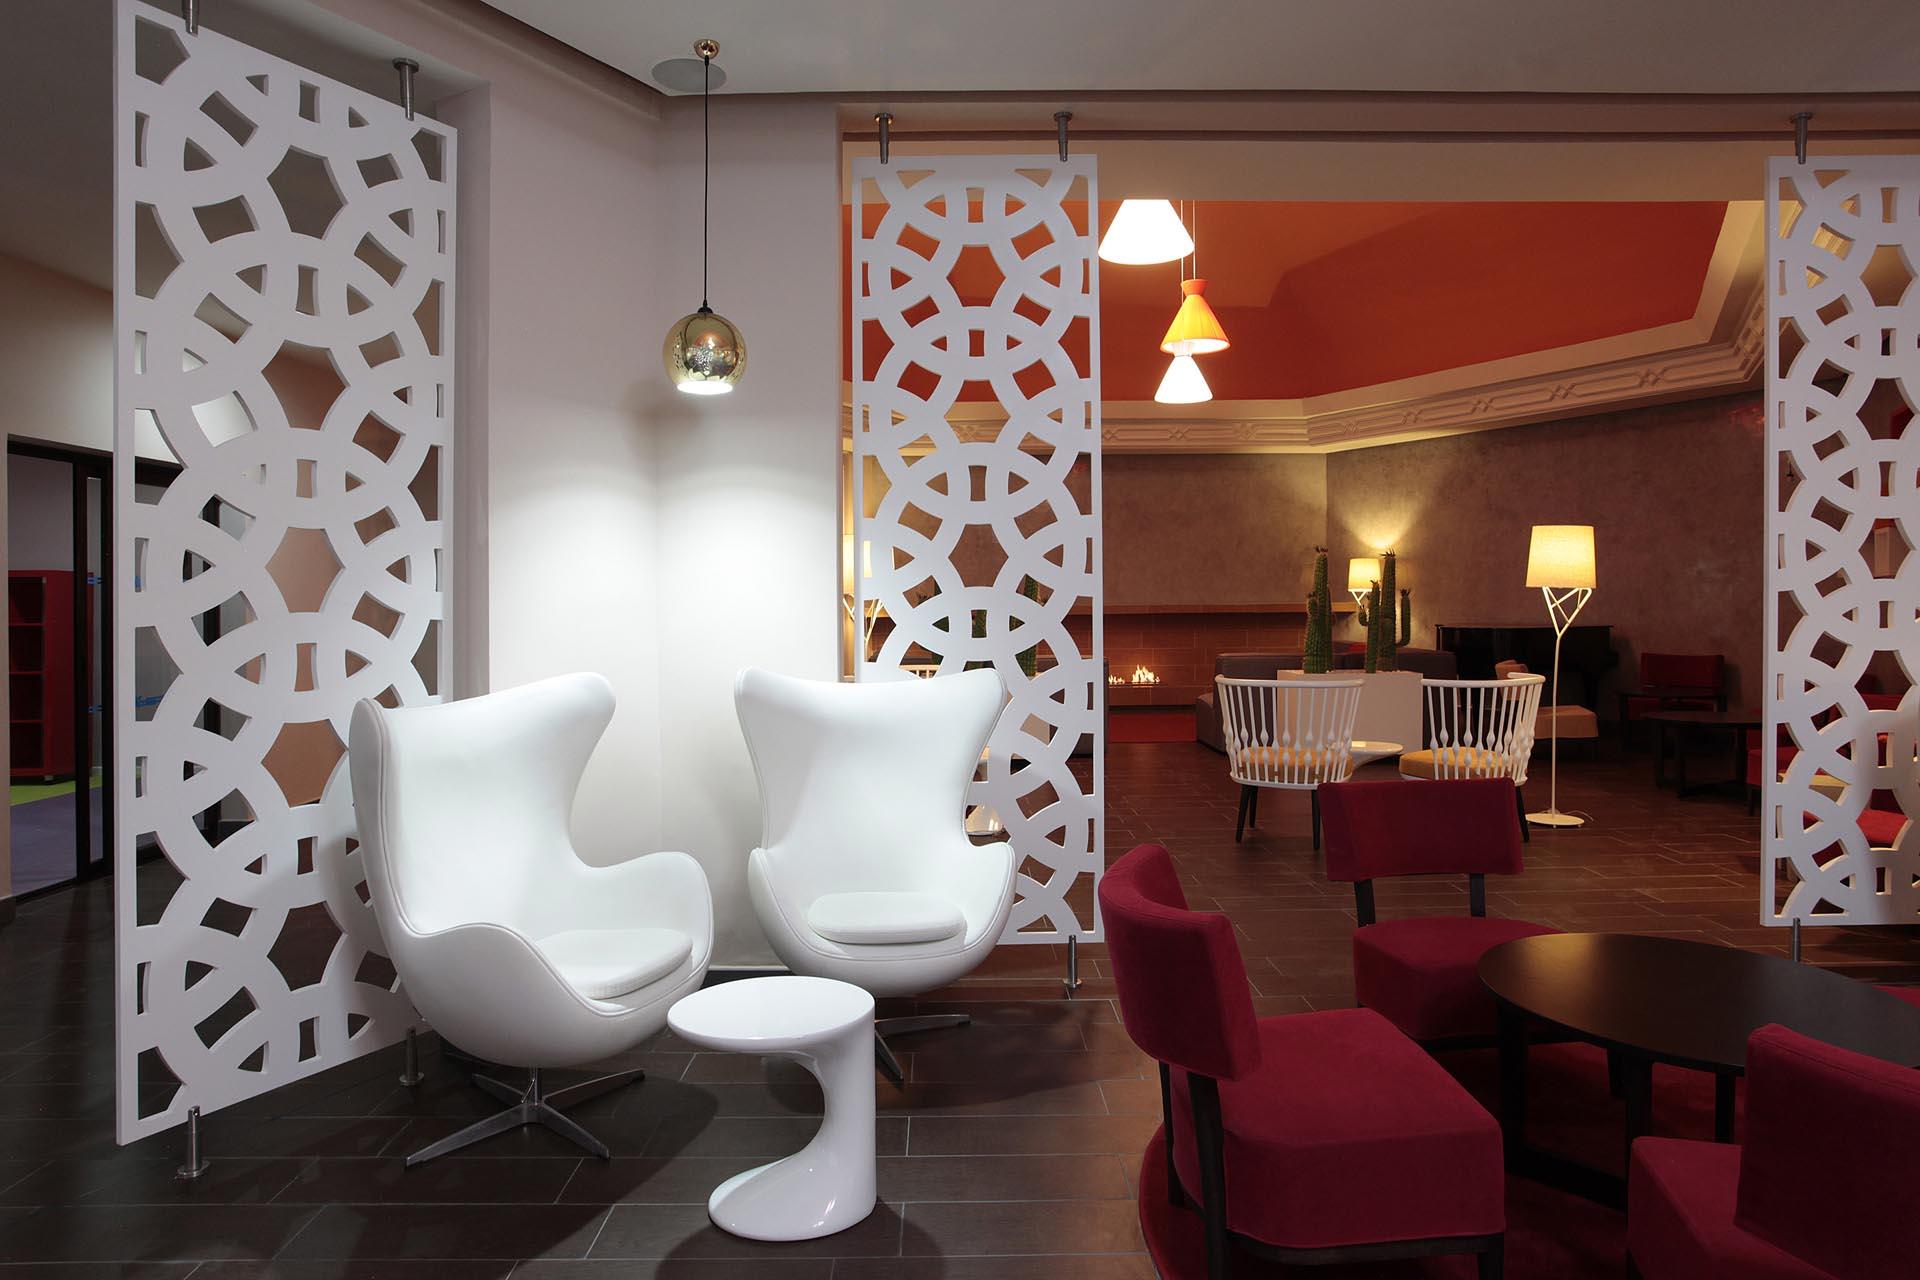 Lobby at Kenzi Europa All Inclusive Hotel in Agadir, Morocco